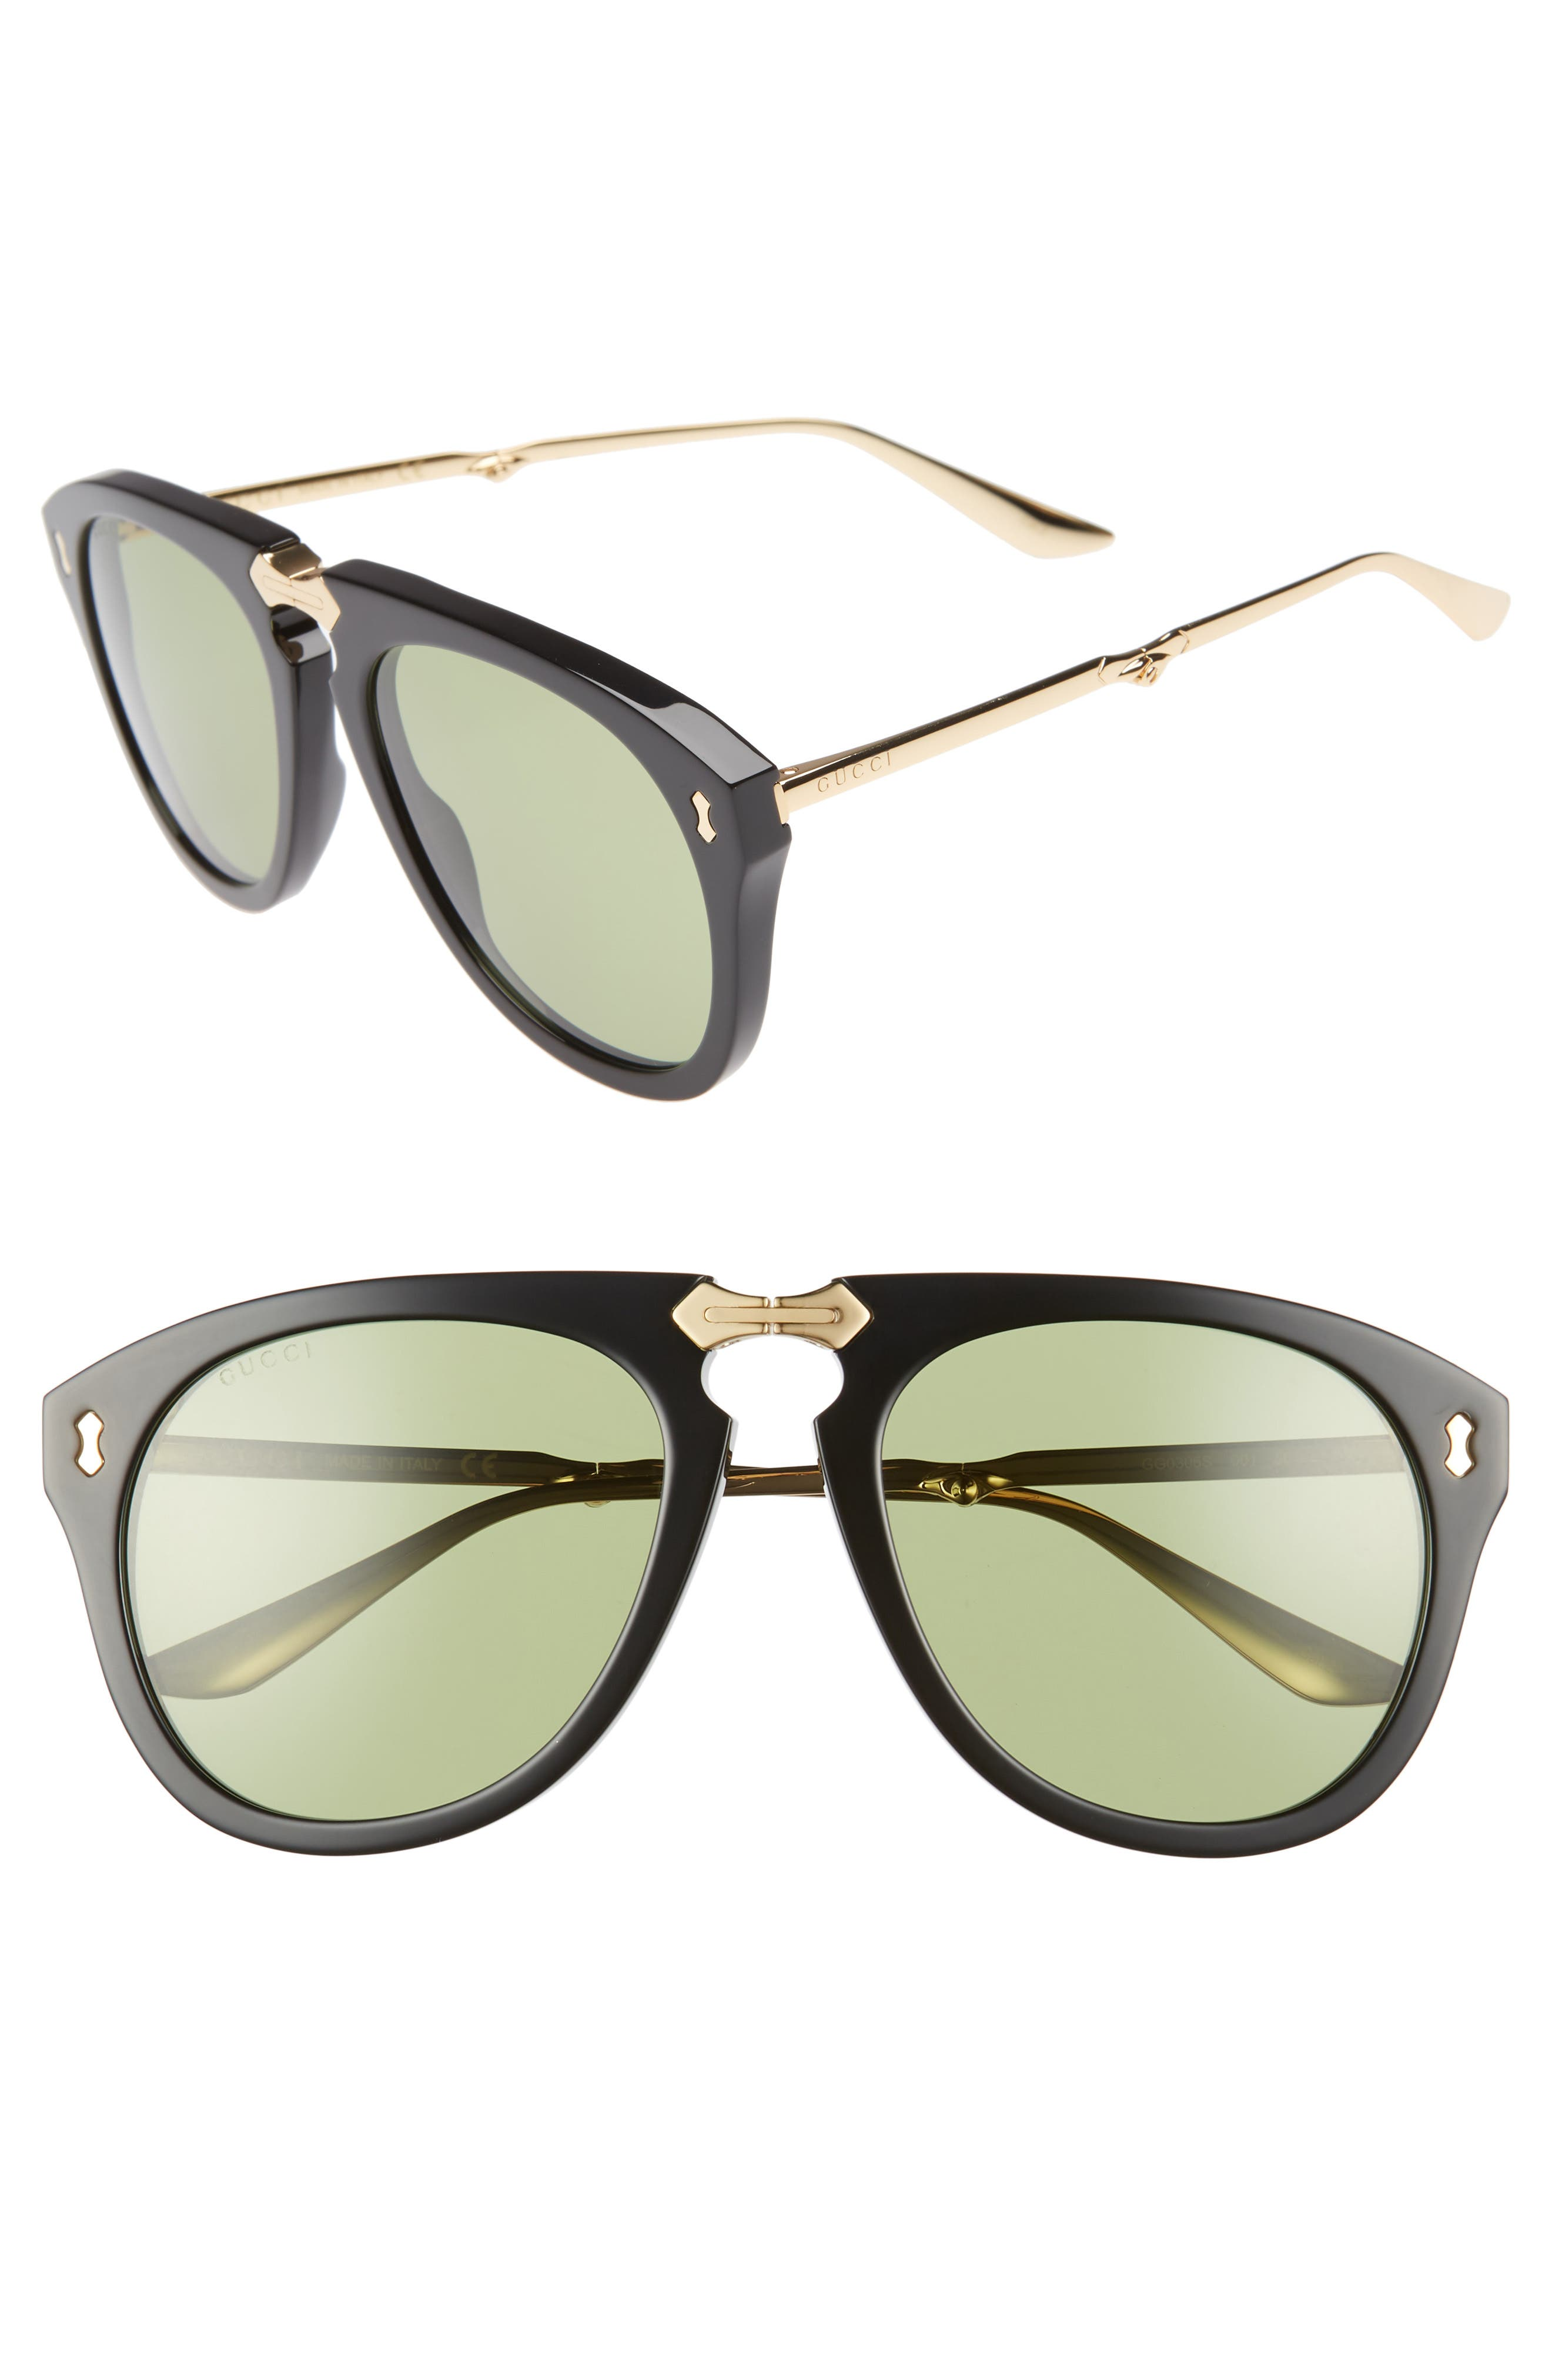 56mm Aviator Sunglasses,                             Main thumbnail 1, color,                             BLACK/ GOLD/ GREEN